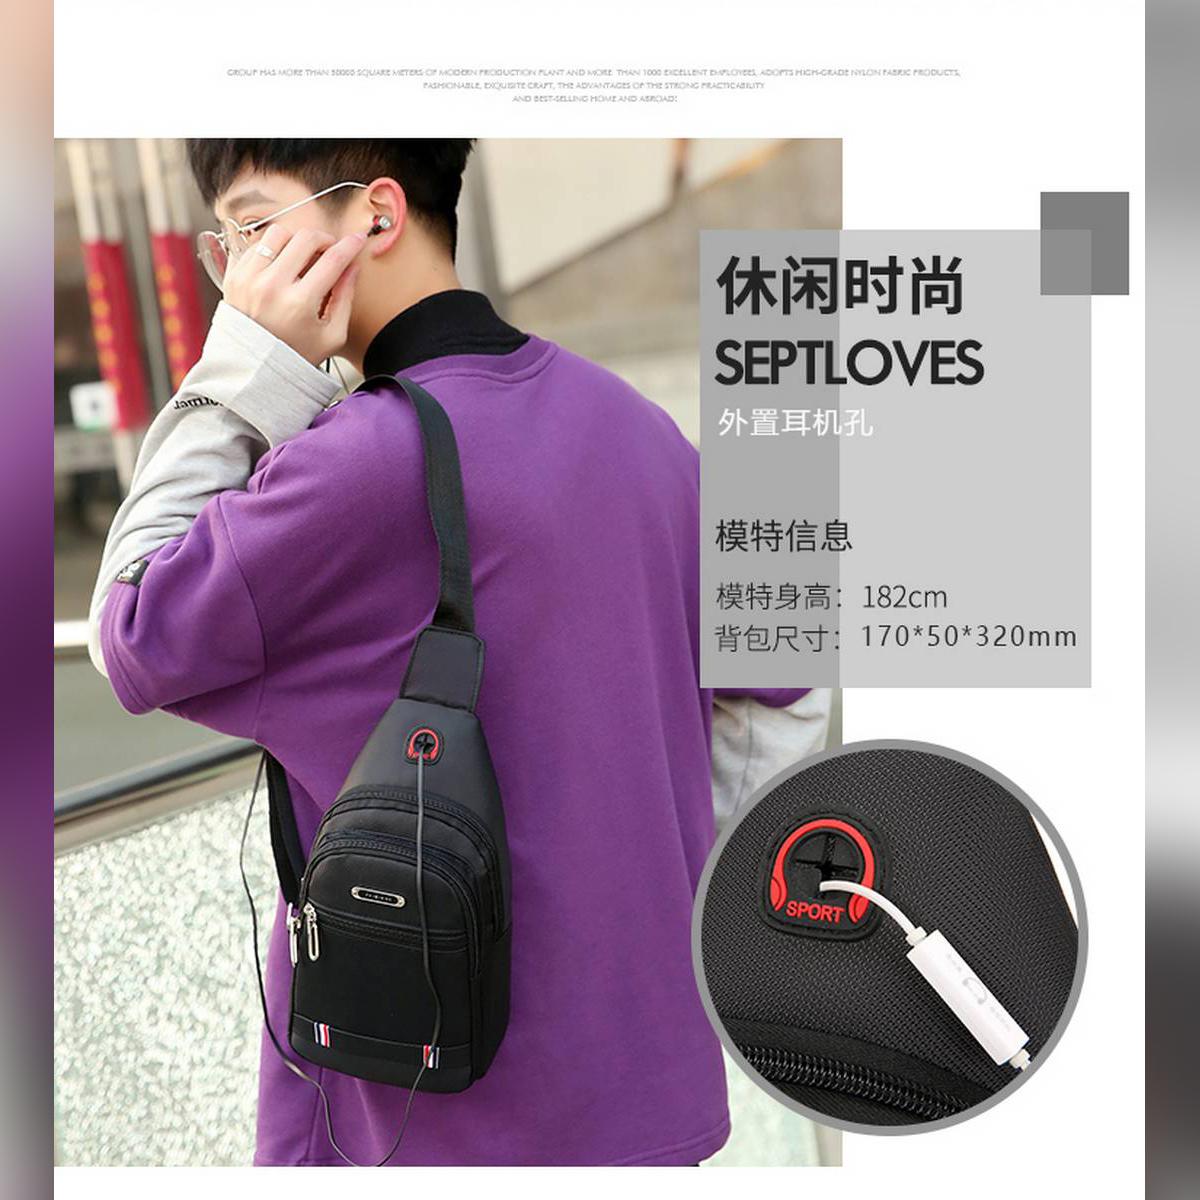 Xierya Men Chest Bag Simple Storage Bag Travel Small Backpack Black Crossbody Bag Mini Coffee Bag Shoulder Bag Satchel Hand Bags